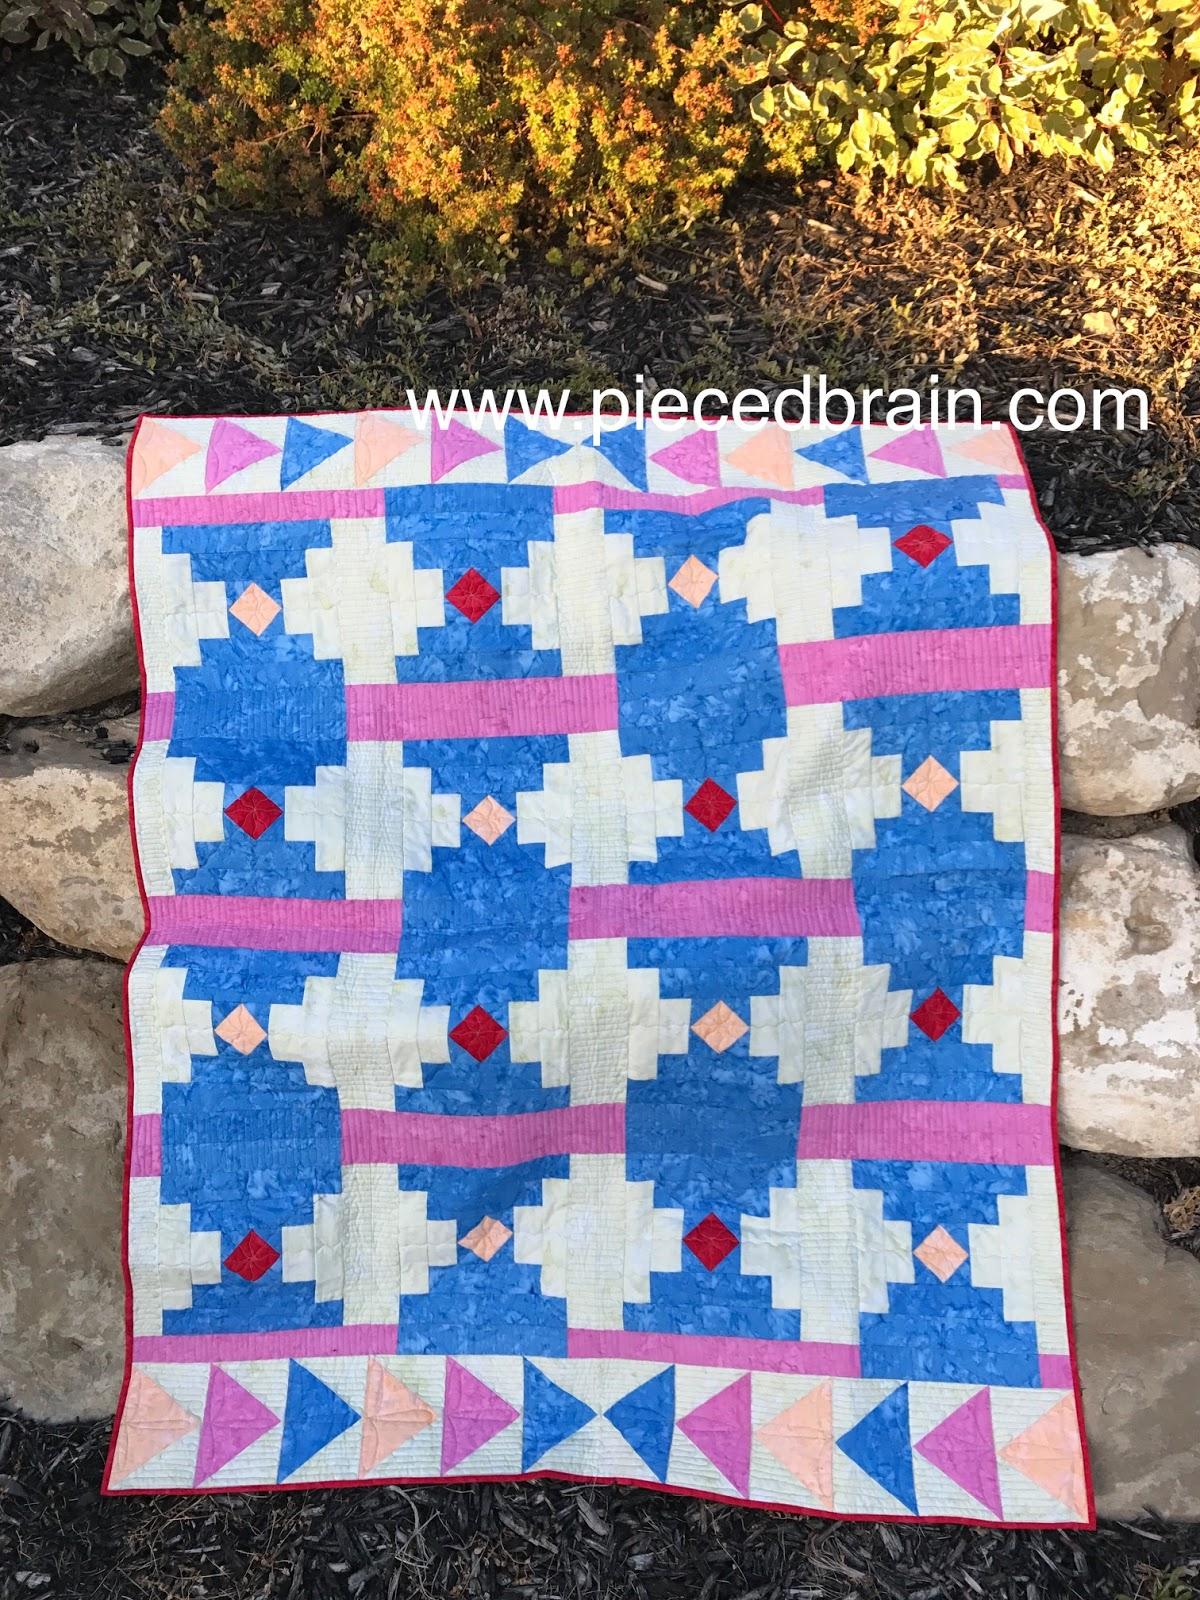 Log Cabin Patterns : Pieced brain log cabin variations quilt